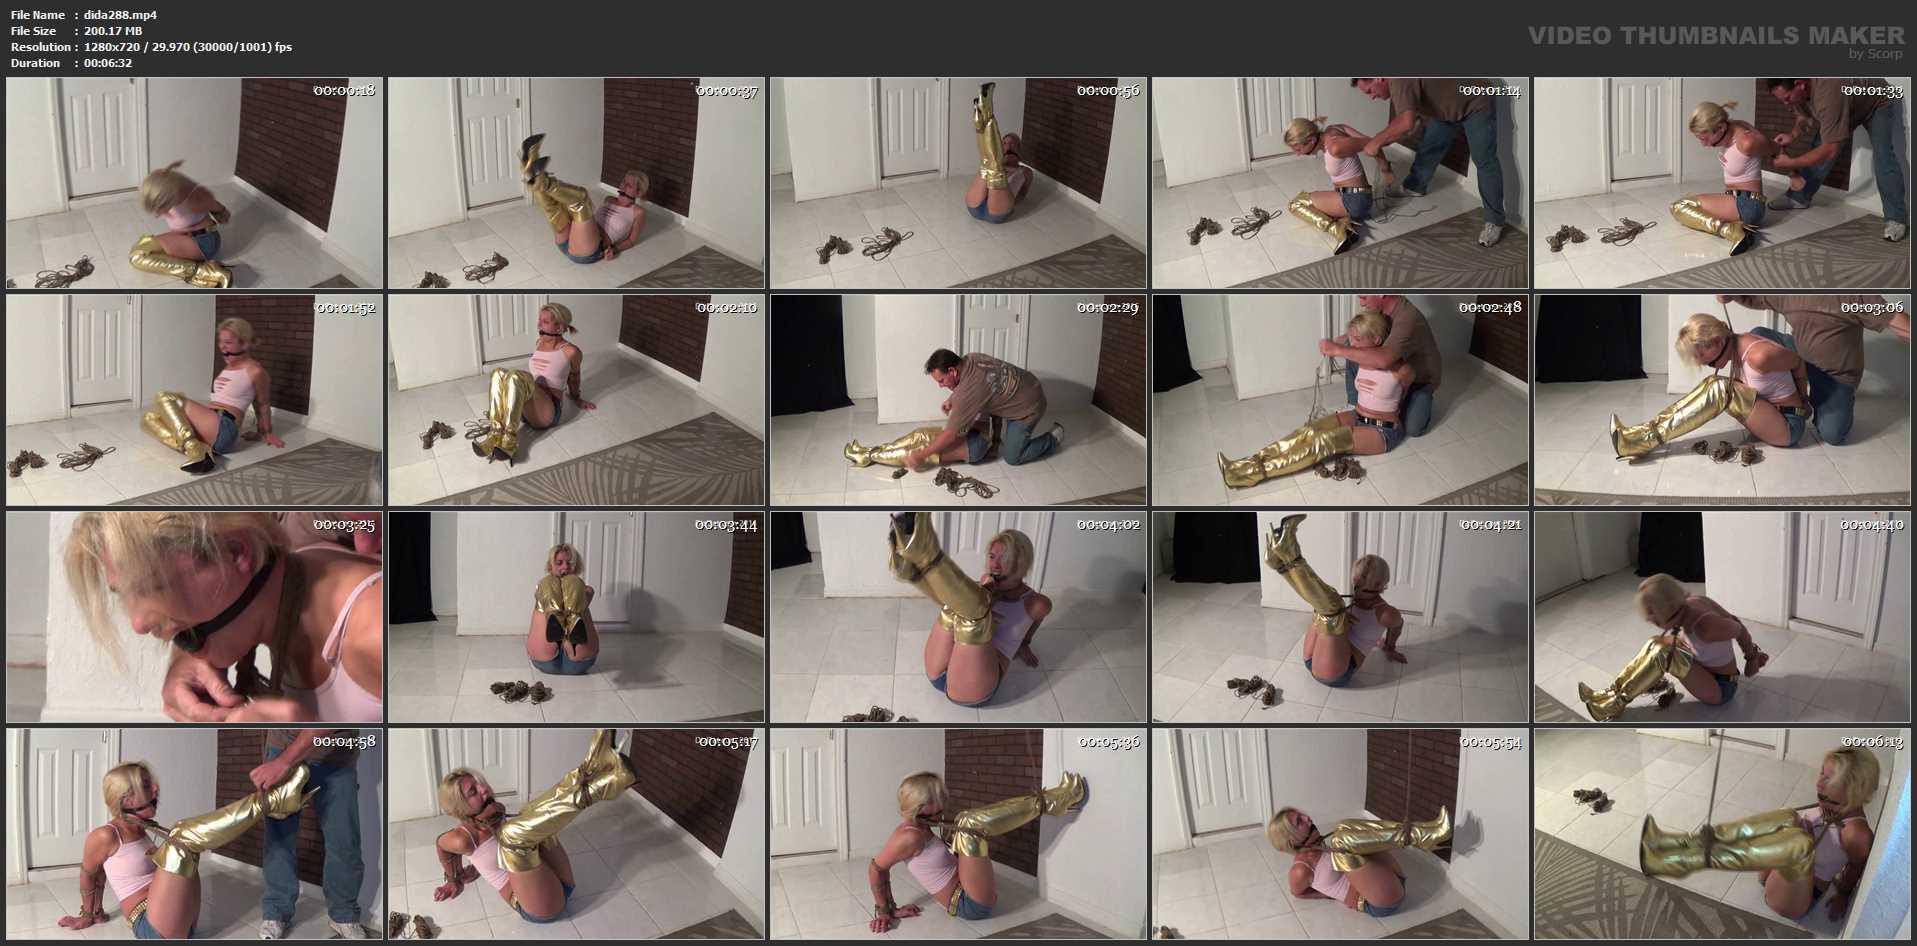 [DIZDAT] Briella Jaden [HD][720p][MP4]